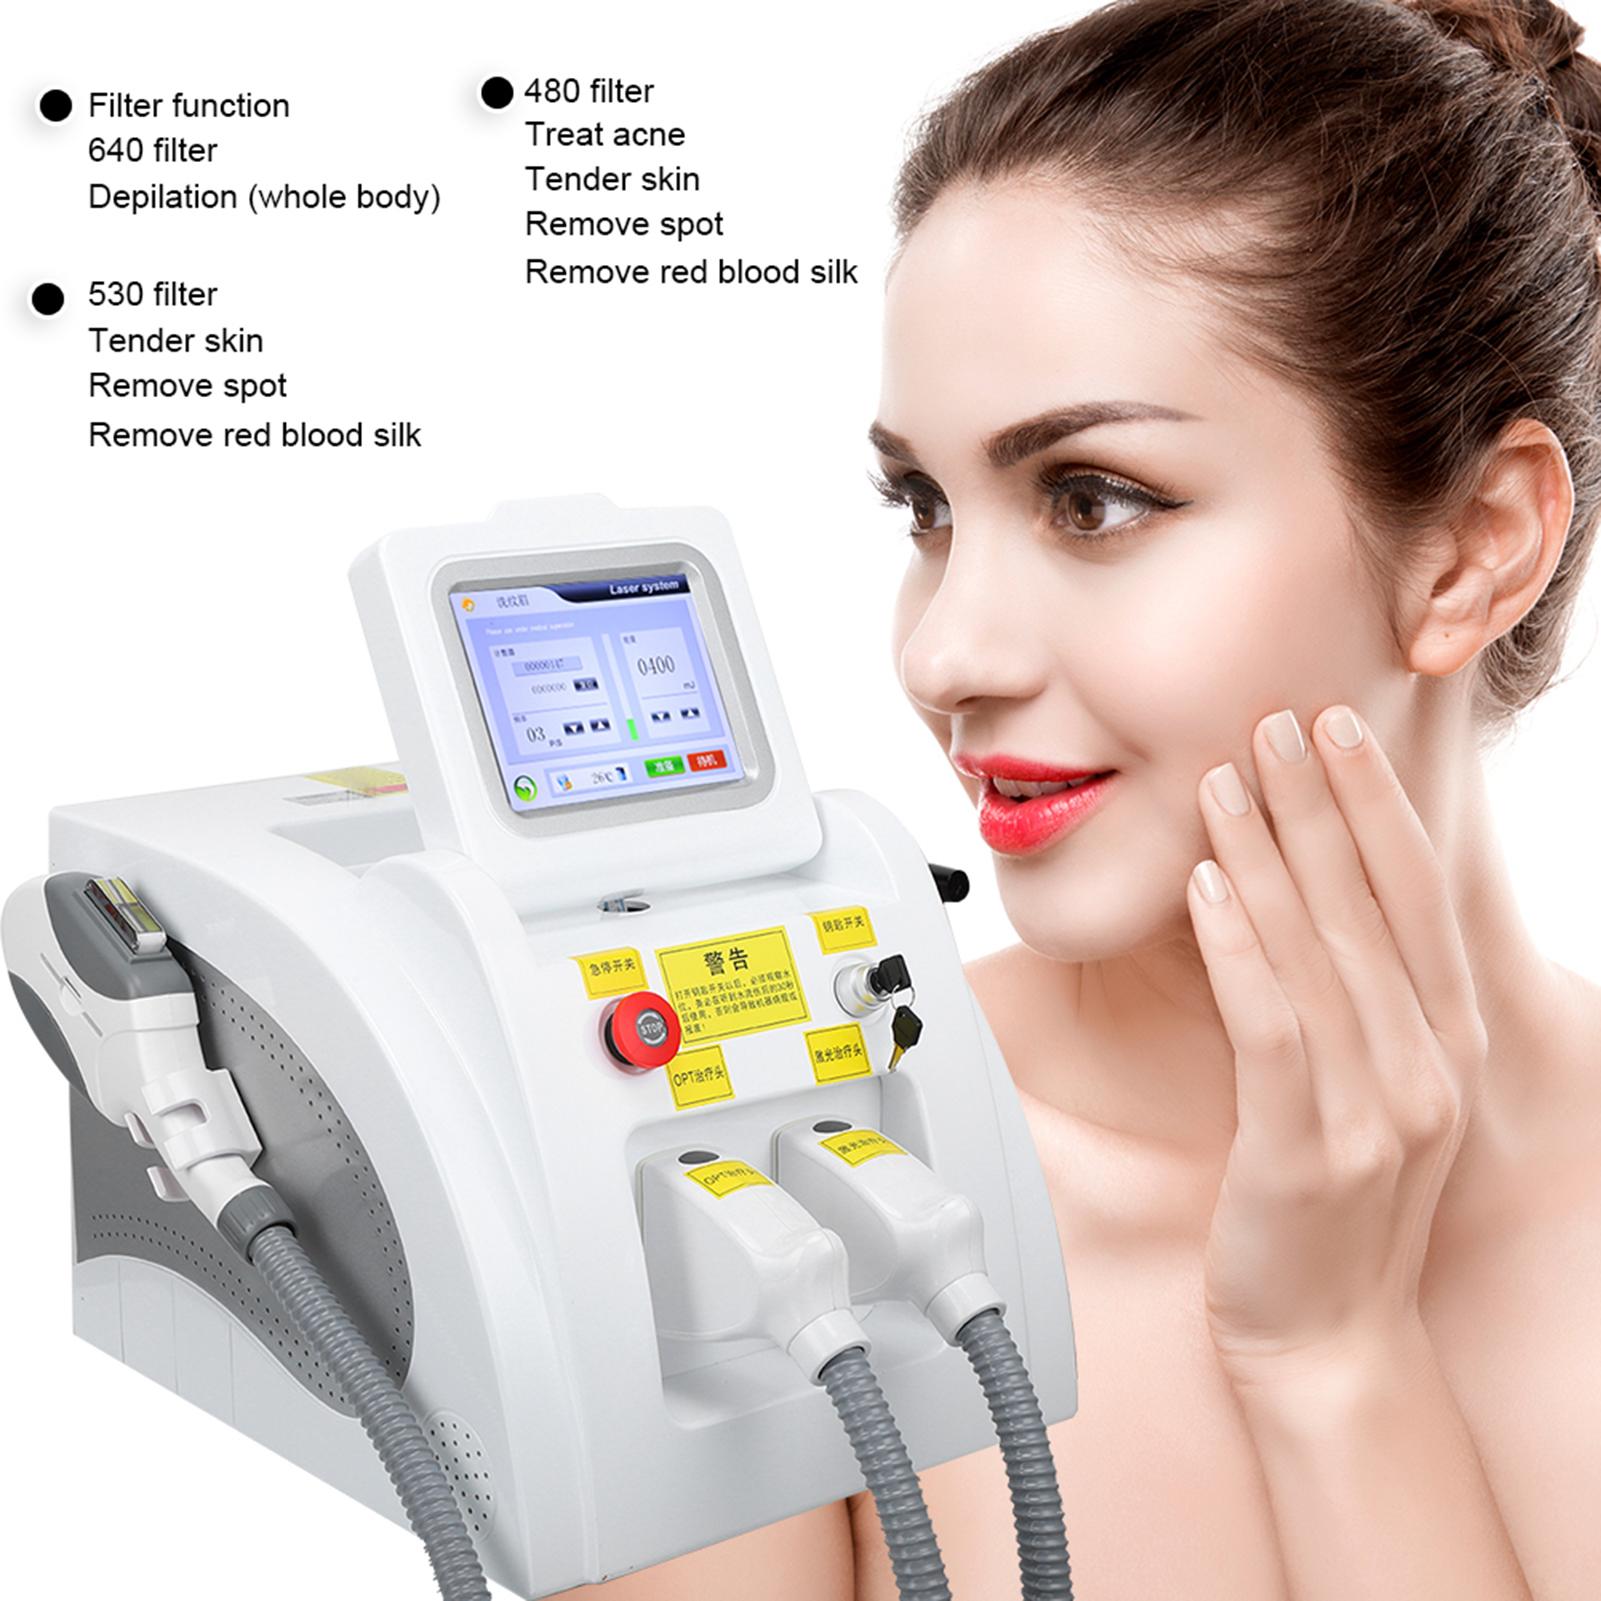 Indexbild 31 - 2In1 SHR OPT IPL Hair Removal RF Laser Skin Rejuvenation Tattoo Removal Machine